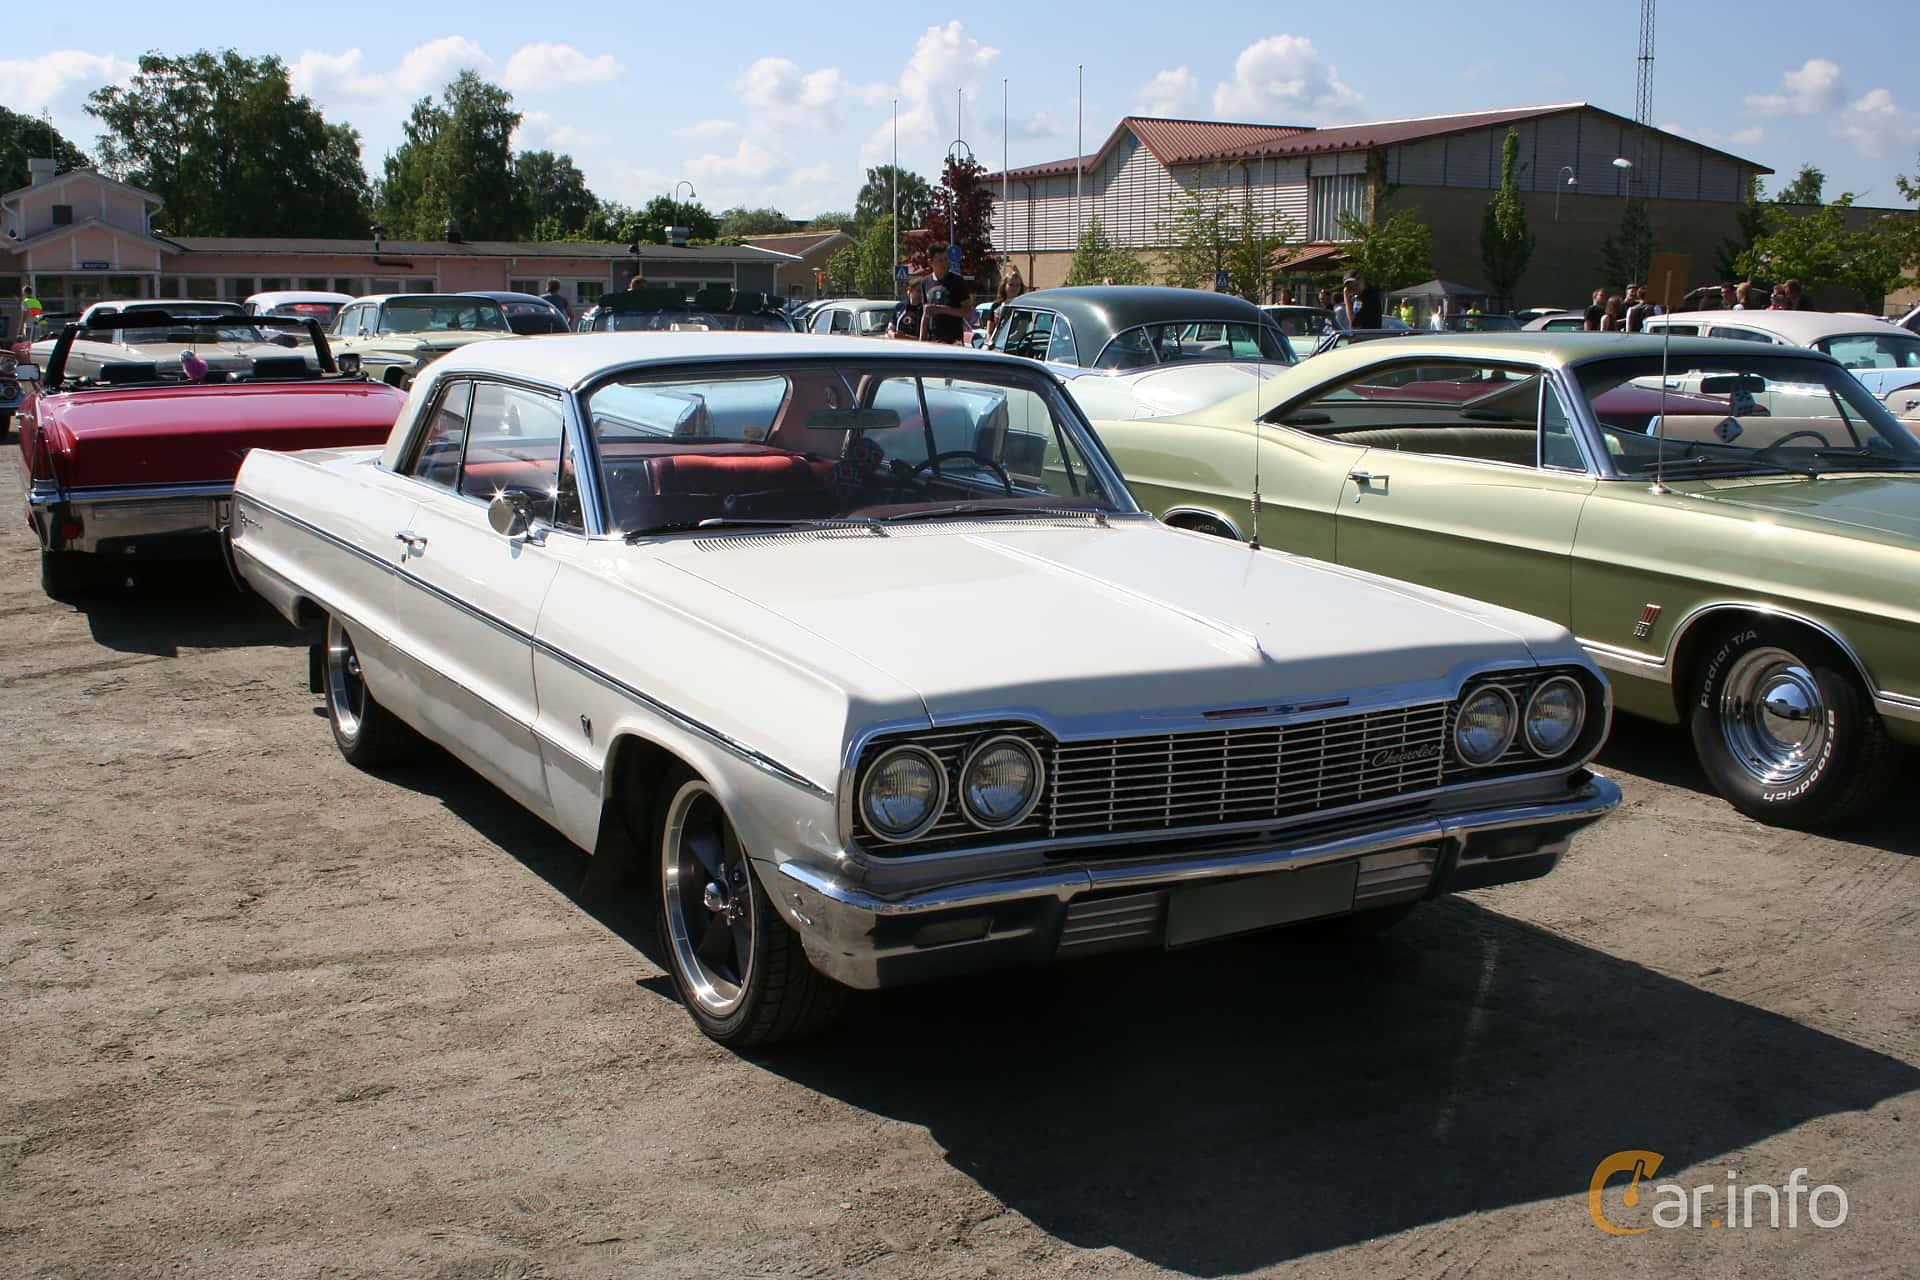 1 images of Chevrolet Impala Sport Coupé 4 6 V8 Manual 198hp 1964